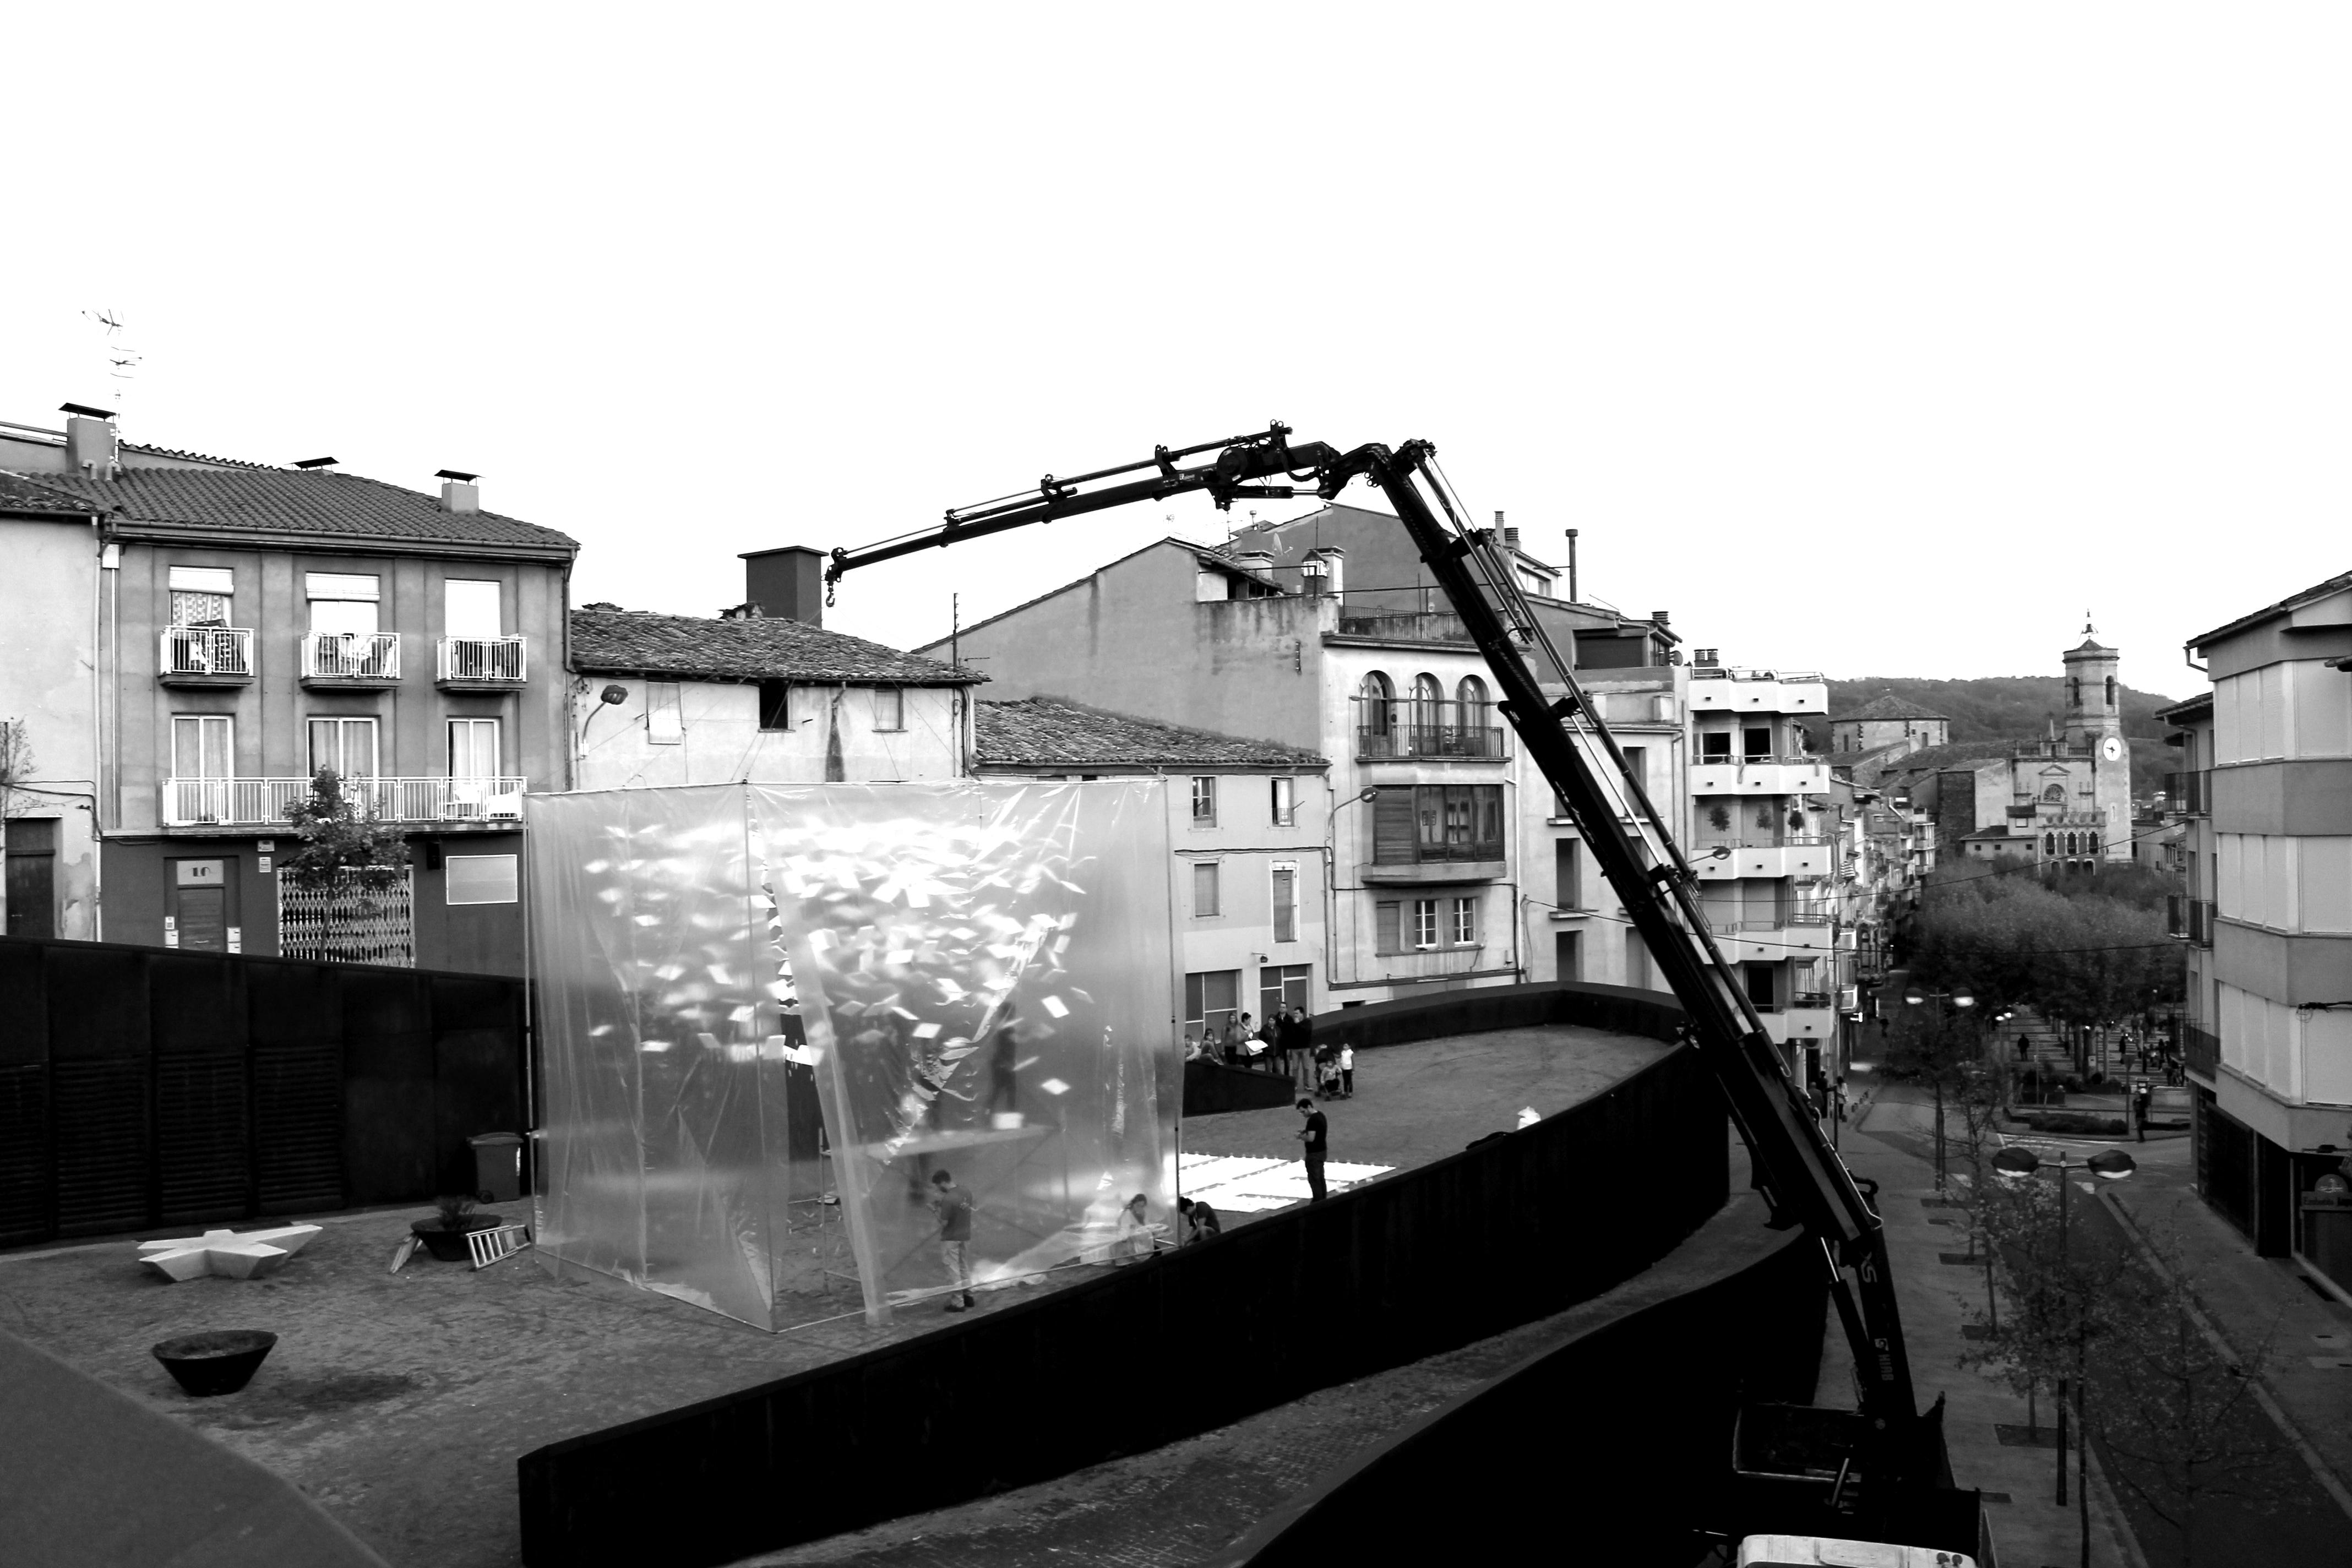 Muntatge 3 - Foto: Jordi Hidalgo Tané